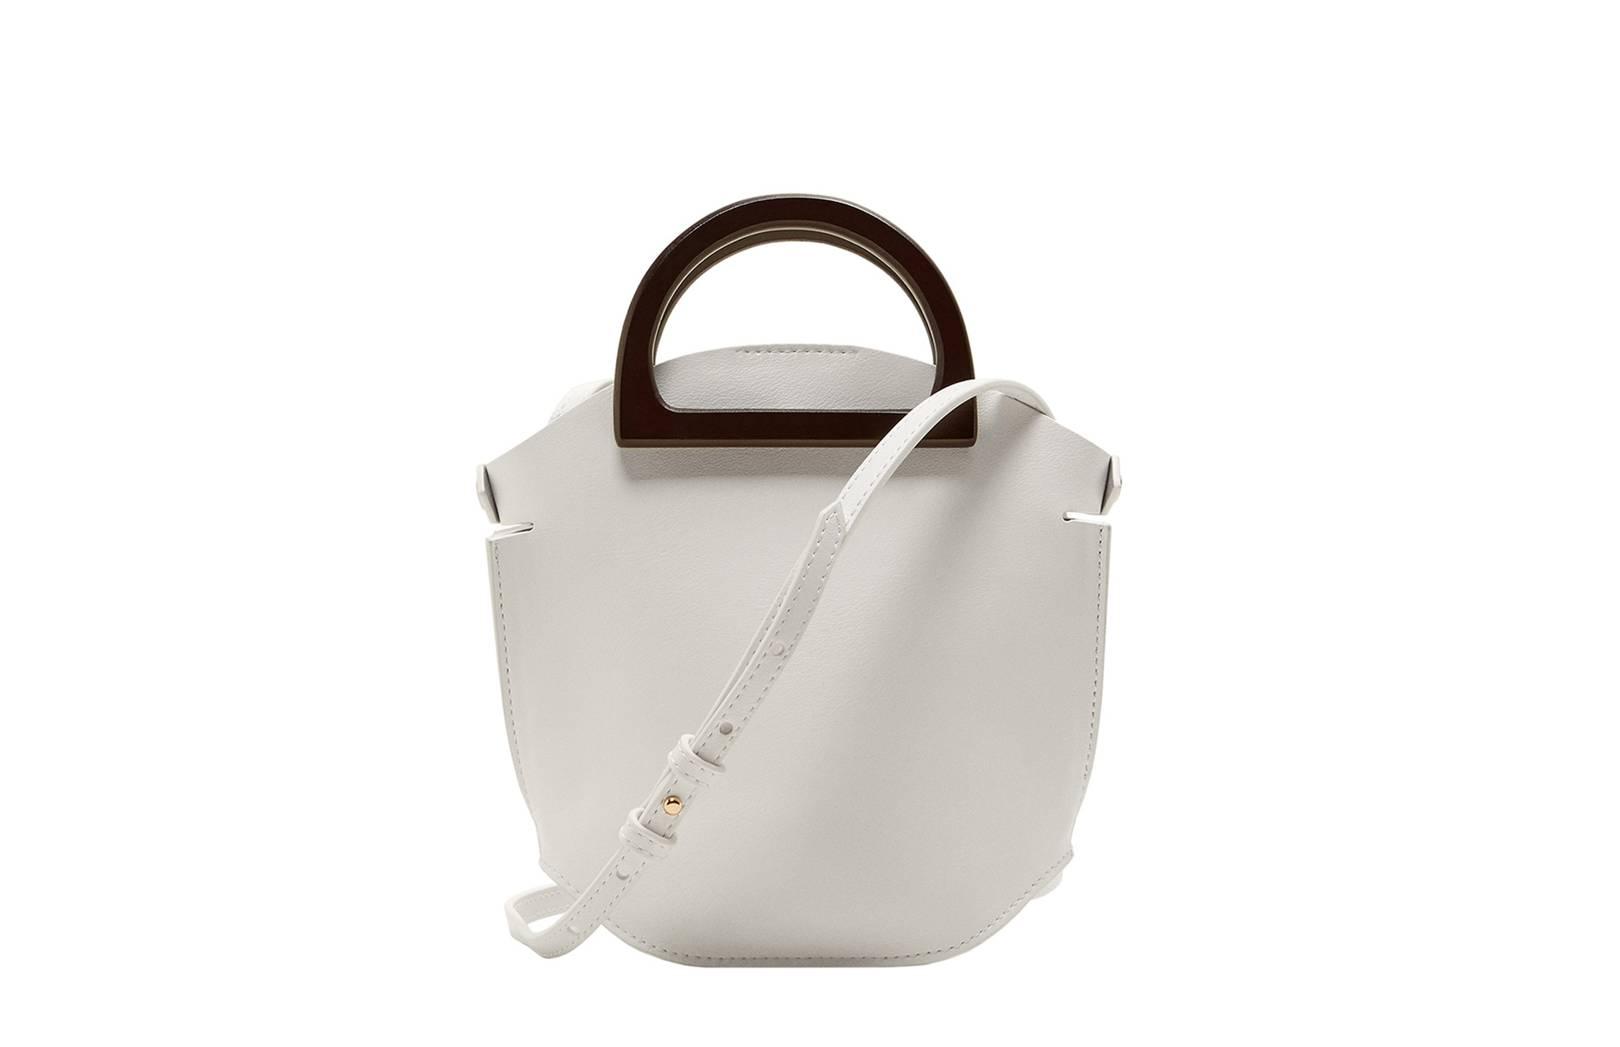 0bafed11309 12 Best Small Handbags To Buy Now | British Vogue